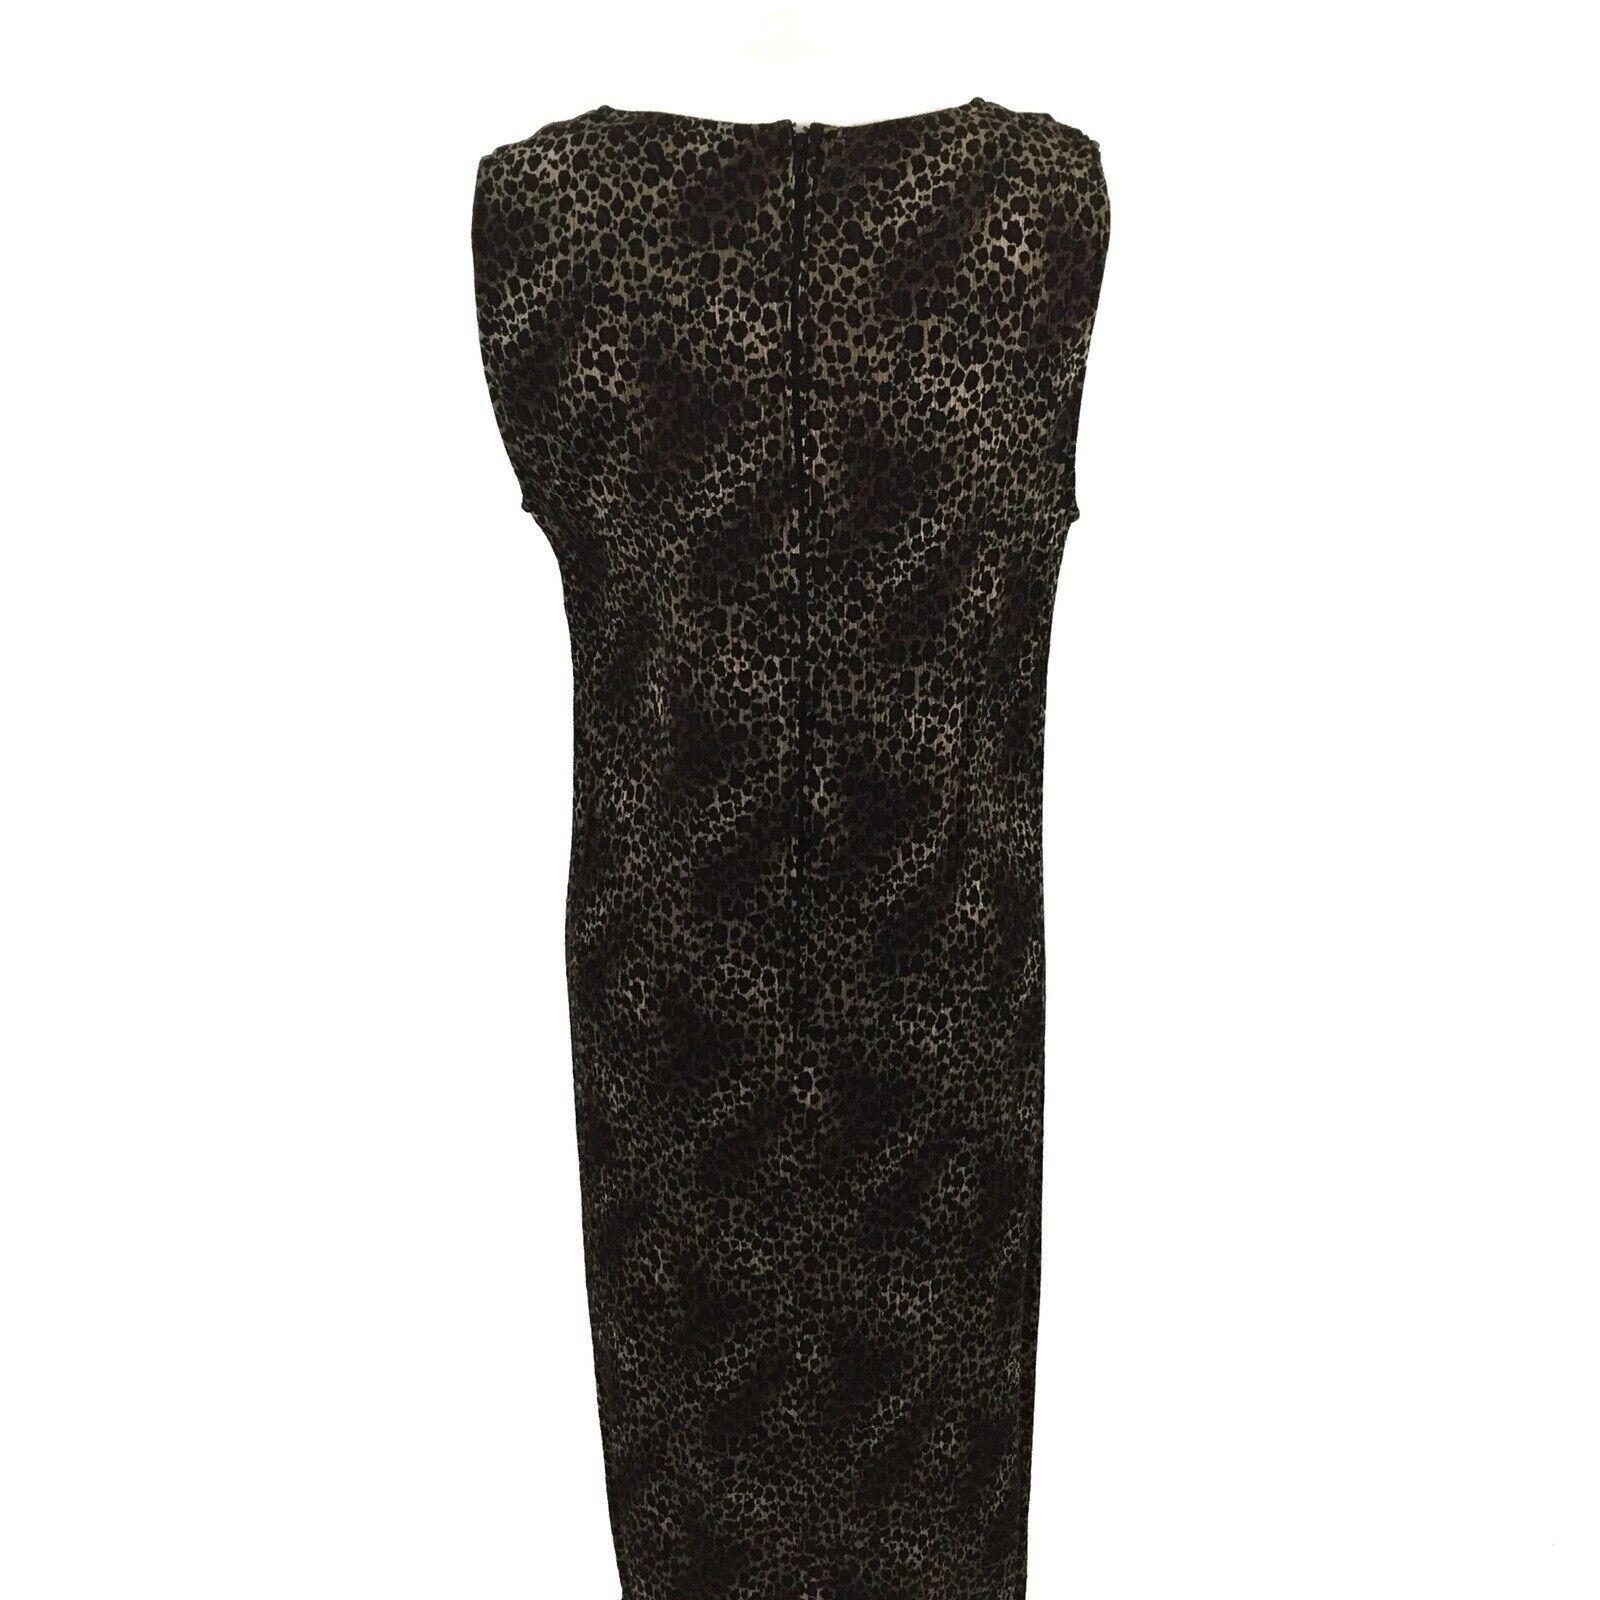 KSL Karin Stevens Sleeveless Maxi Dress and Jacket Size 14W Brown Animal Print image 9